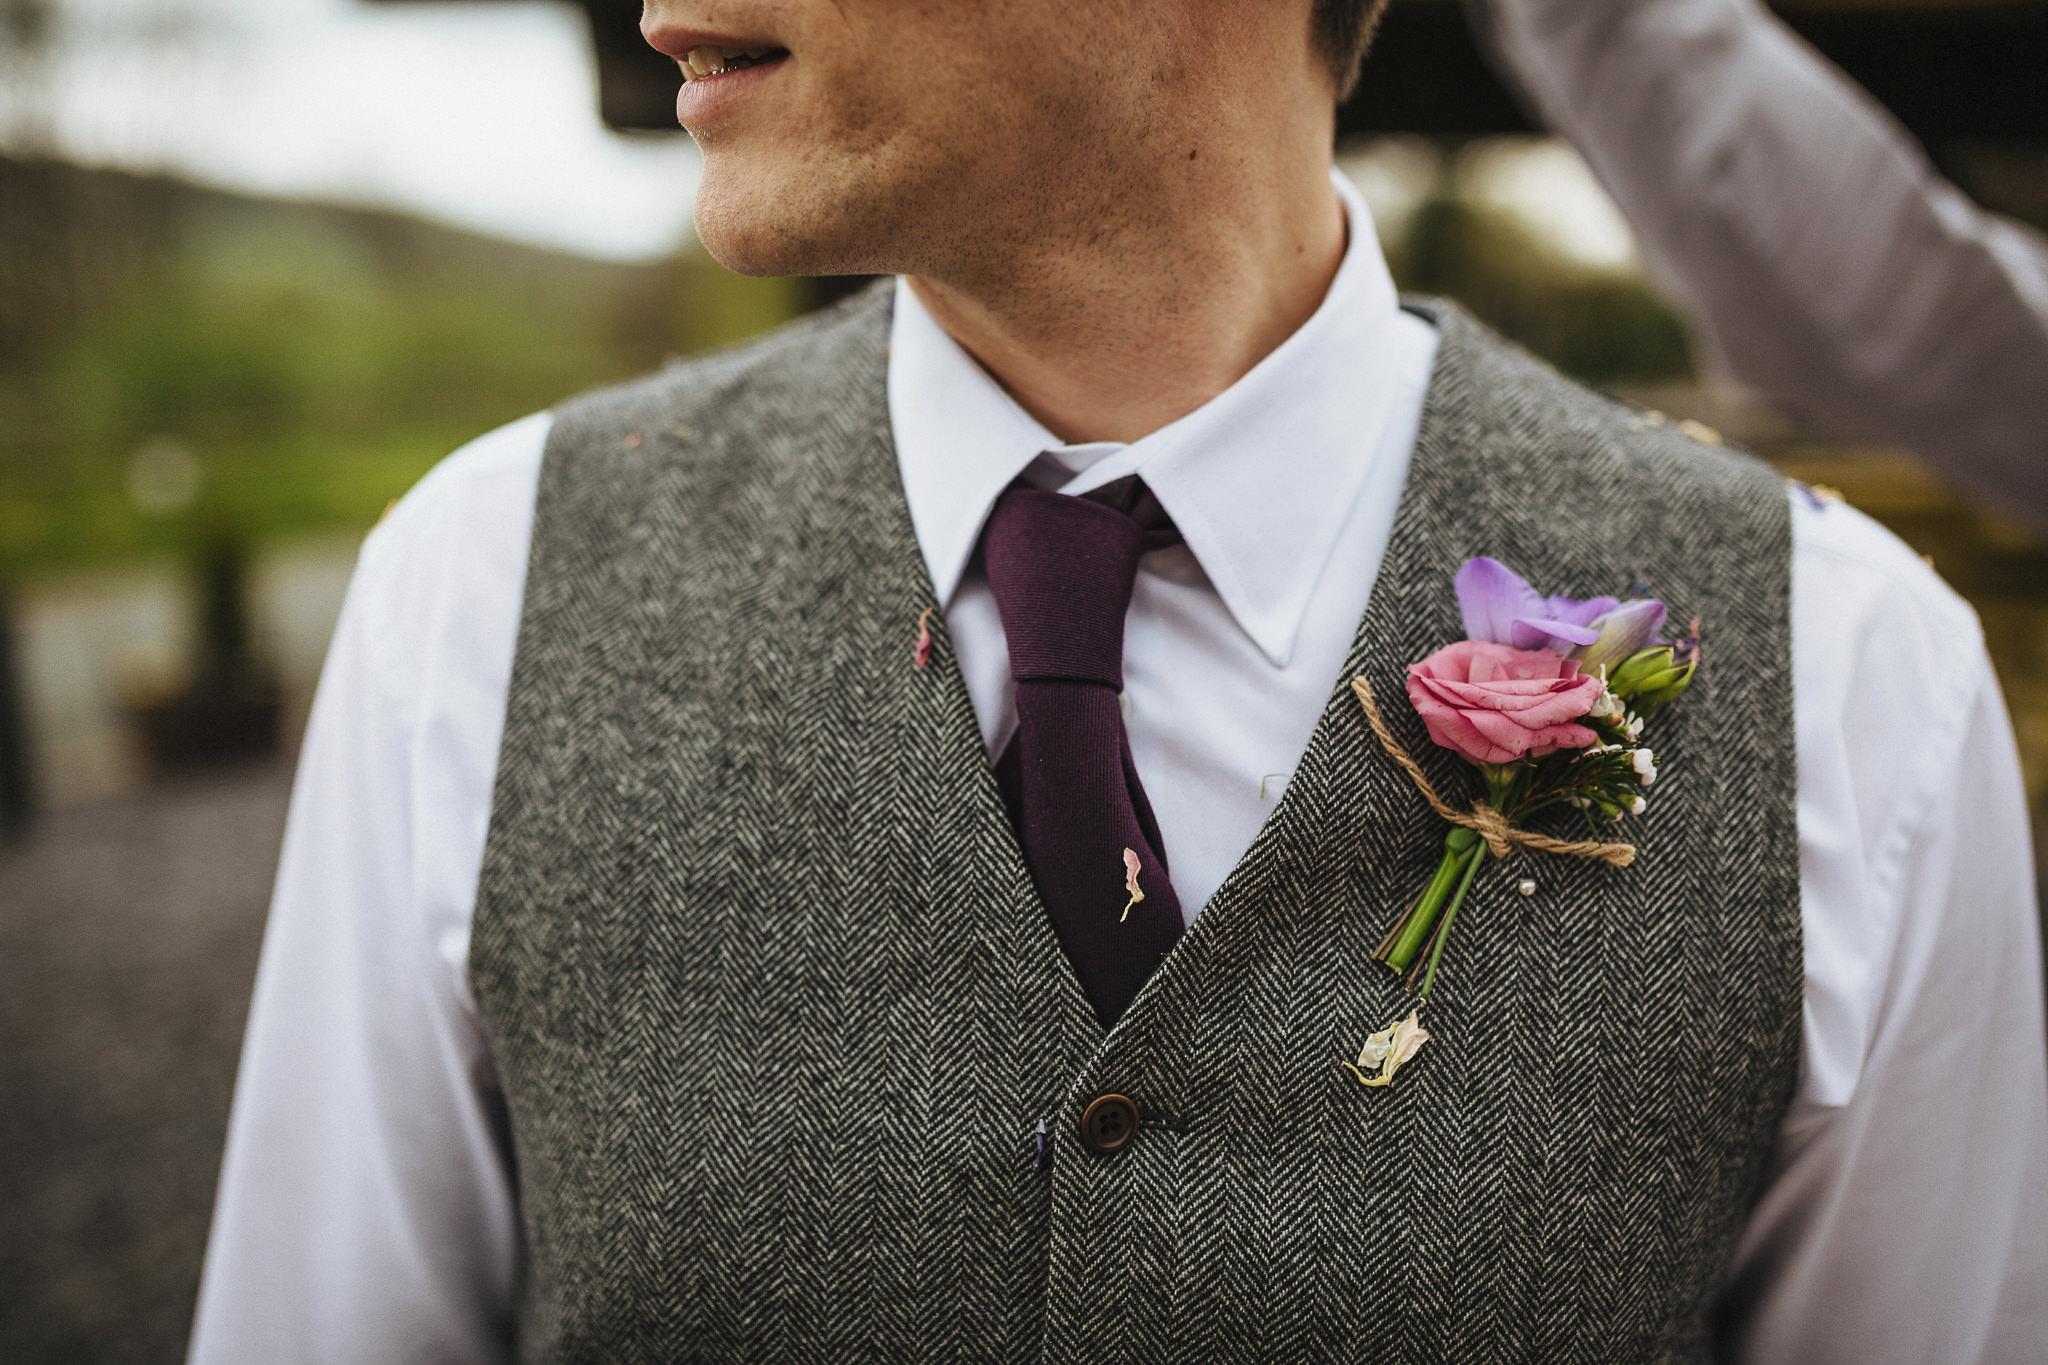 plas-isaf-corwen-north wales wedding-photography-photographer-91043